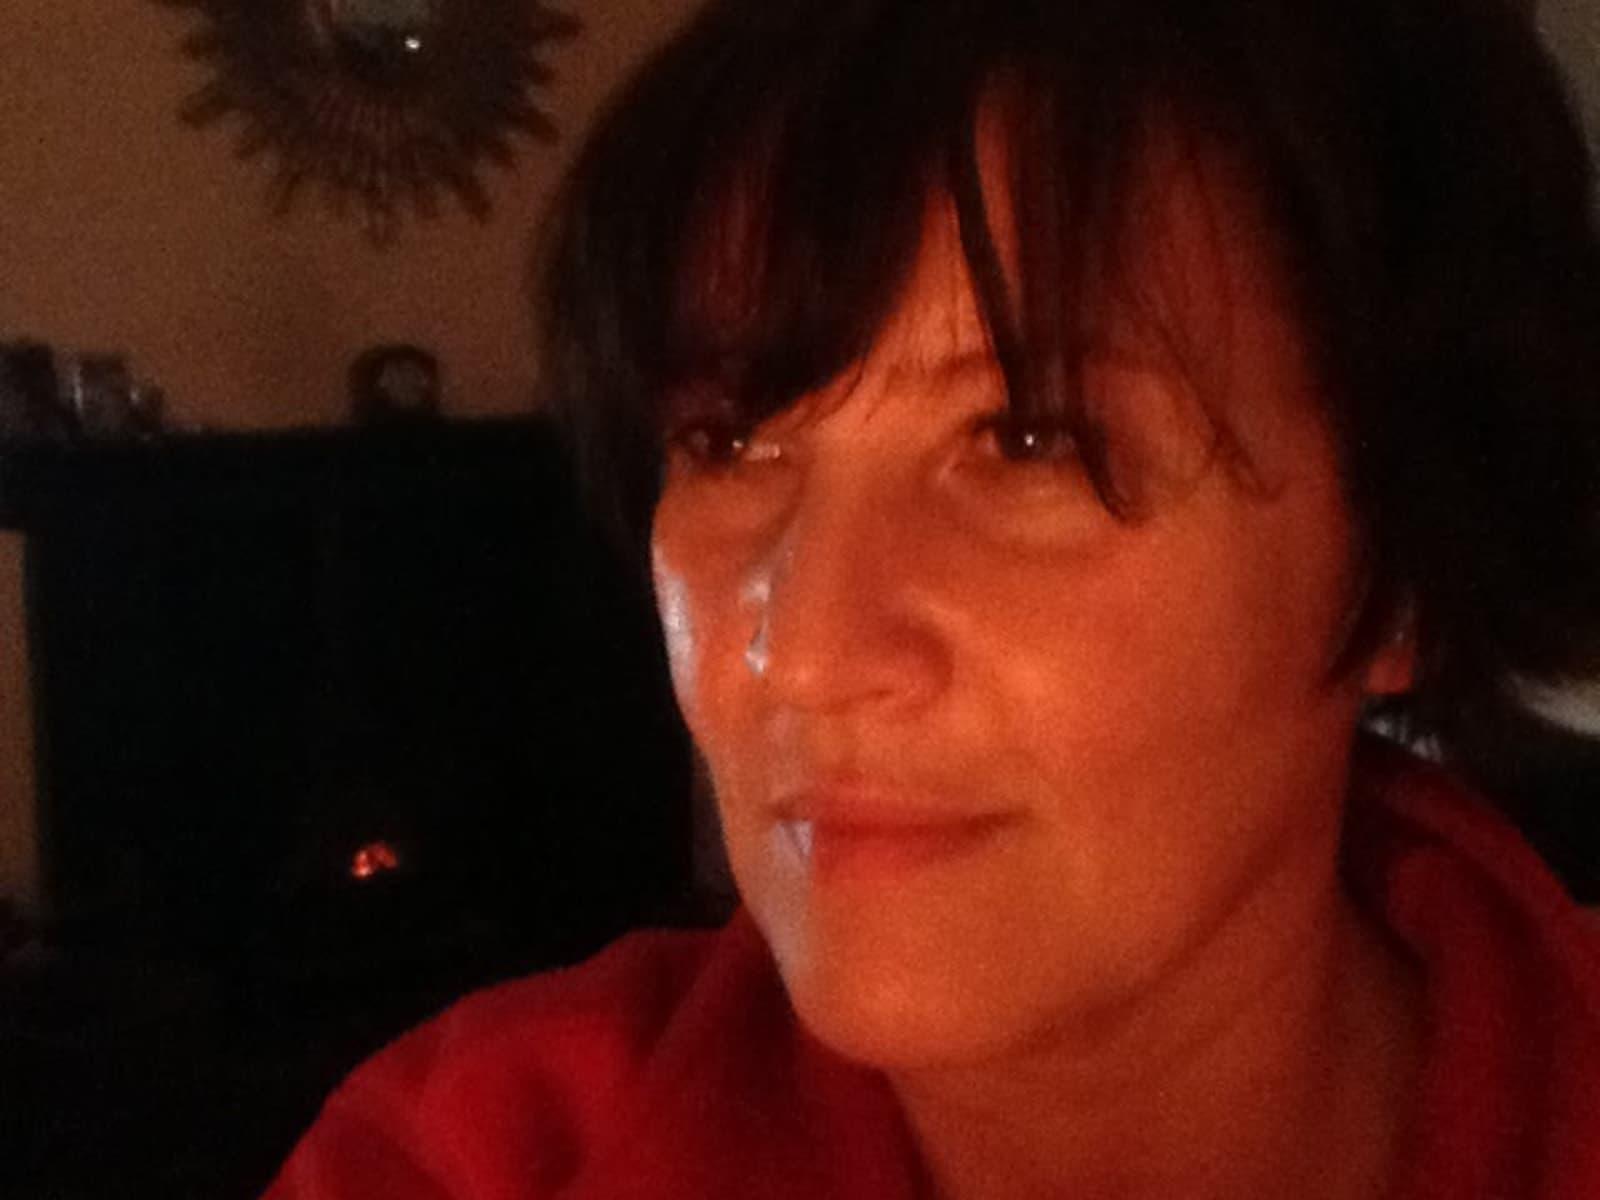 Philippa from Carlisle, United Kingdom